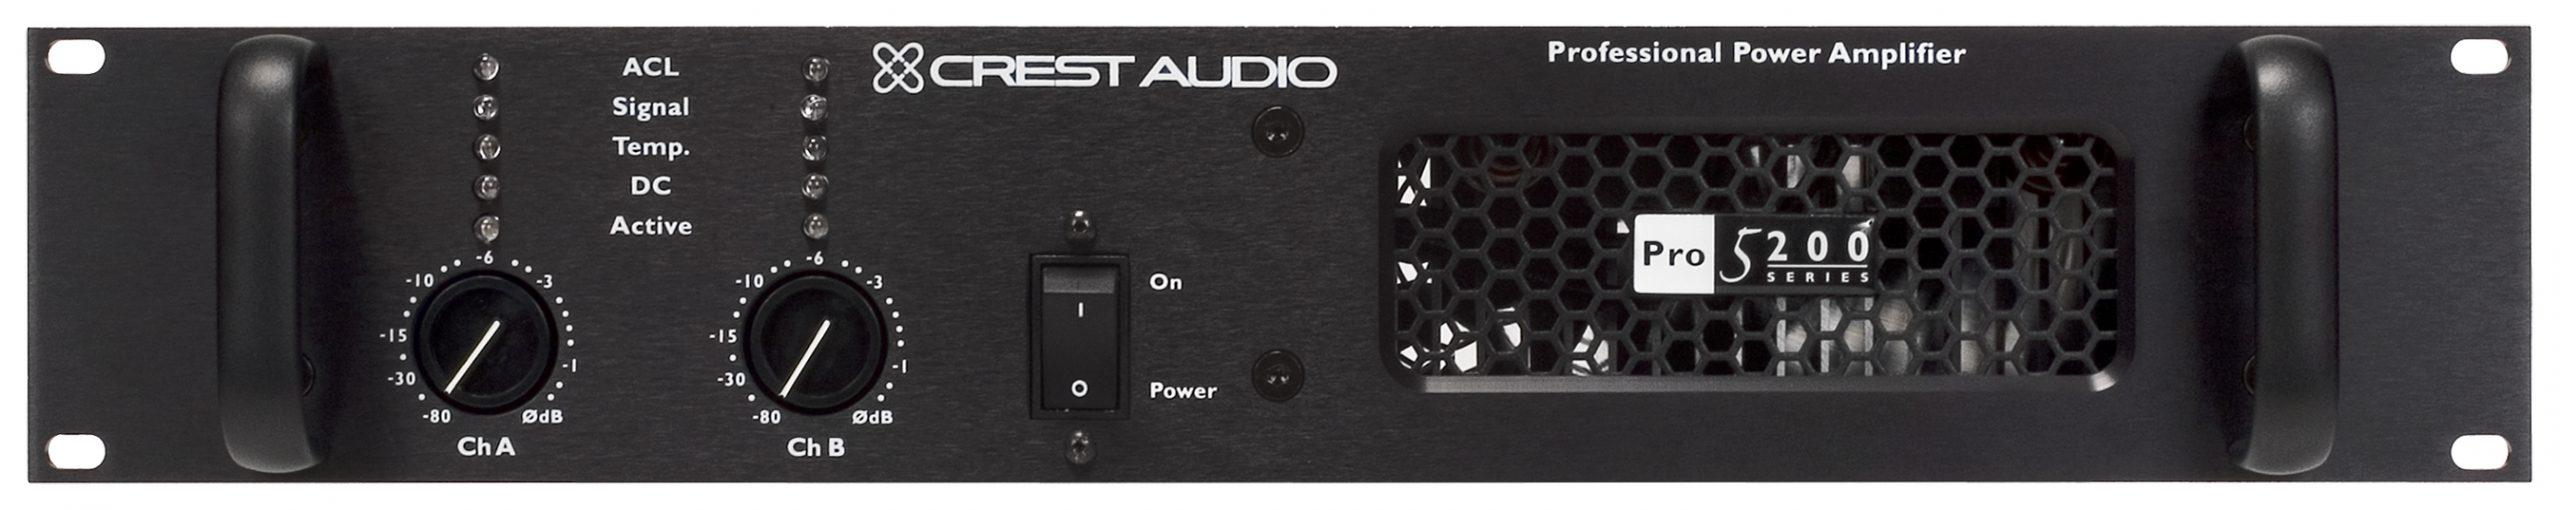 Image result for crest audio pro 5200